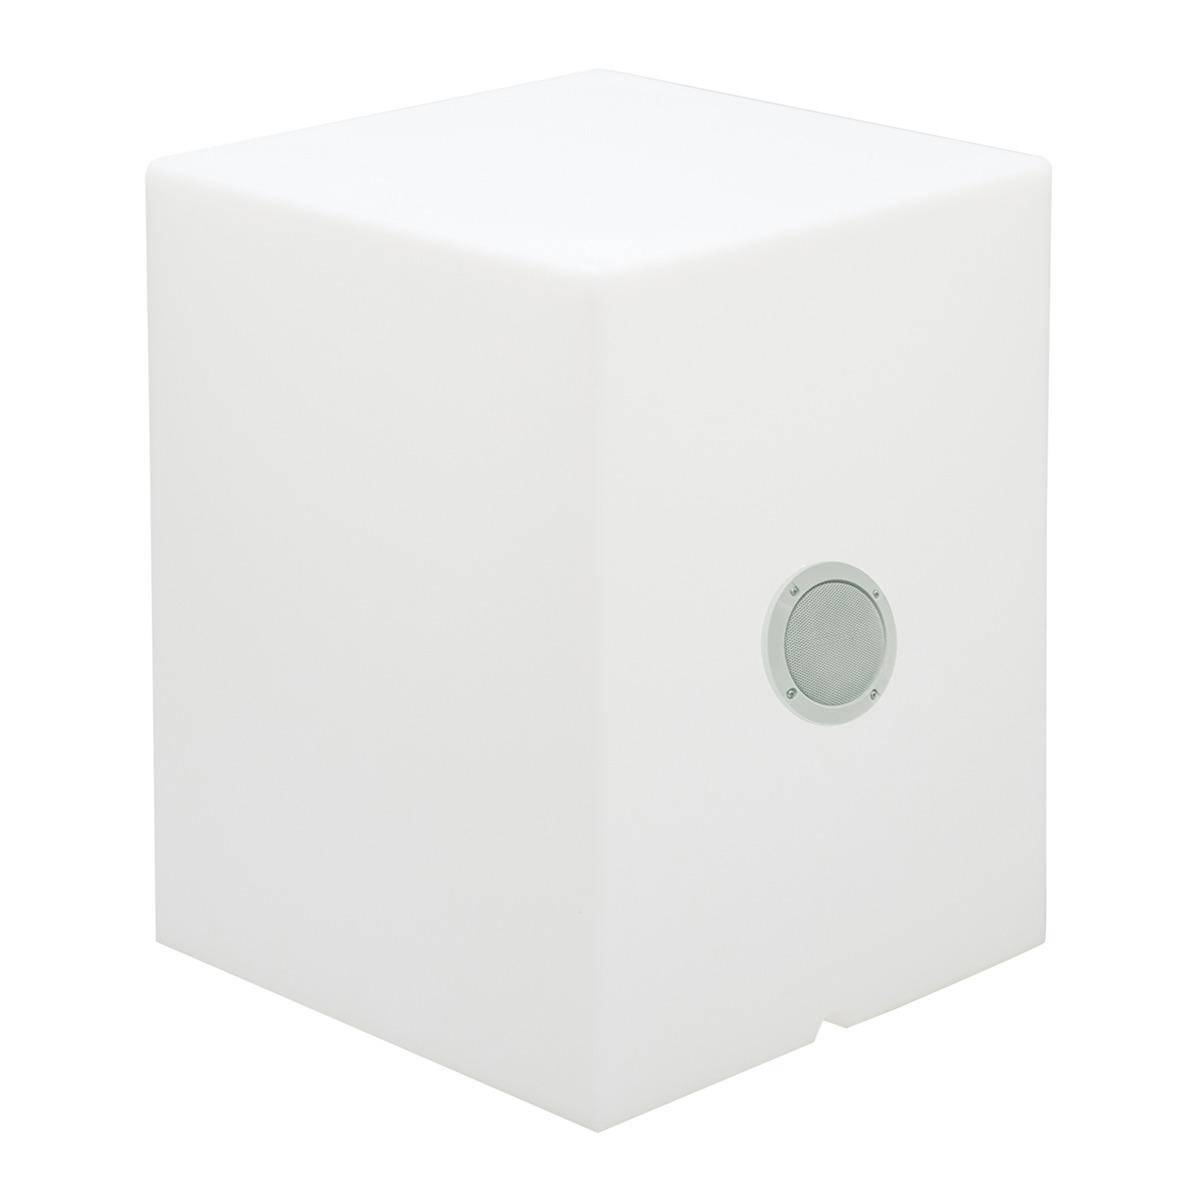 Cuby 32 Cubo iluminado Exterior play batería recargable LED RGB 32x32x32cm